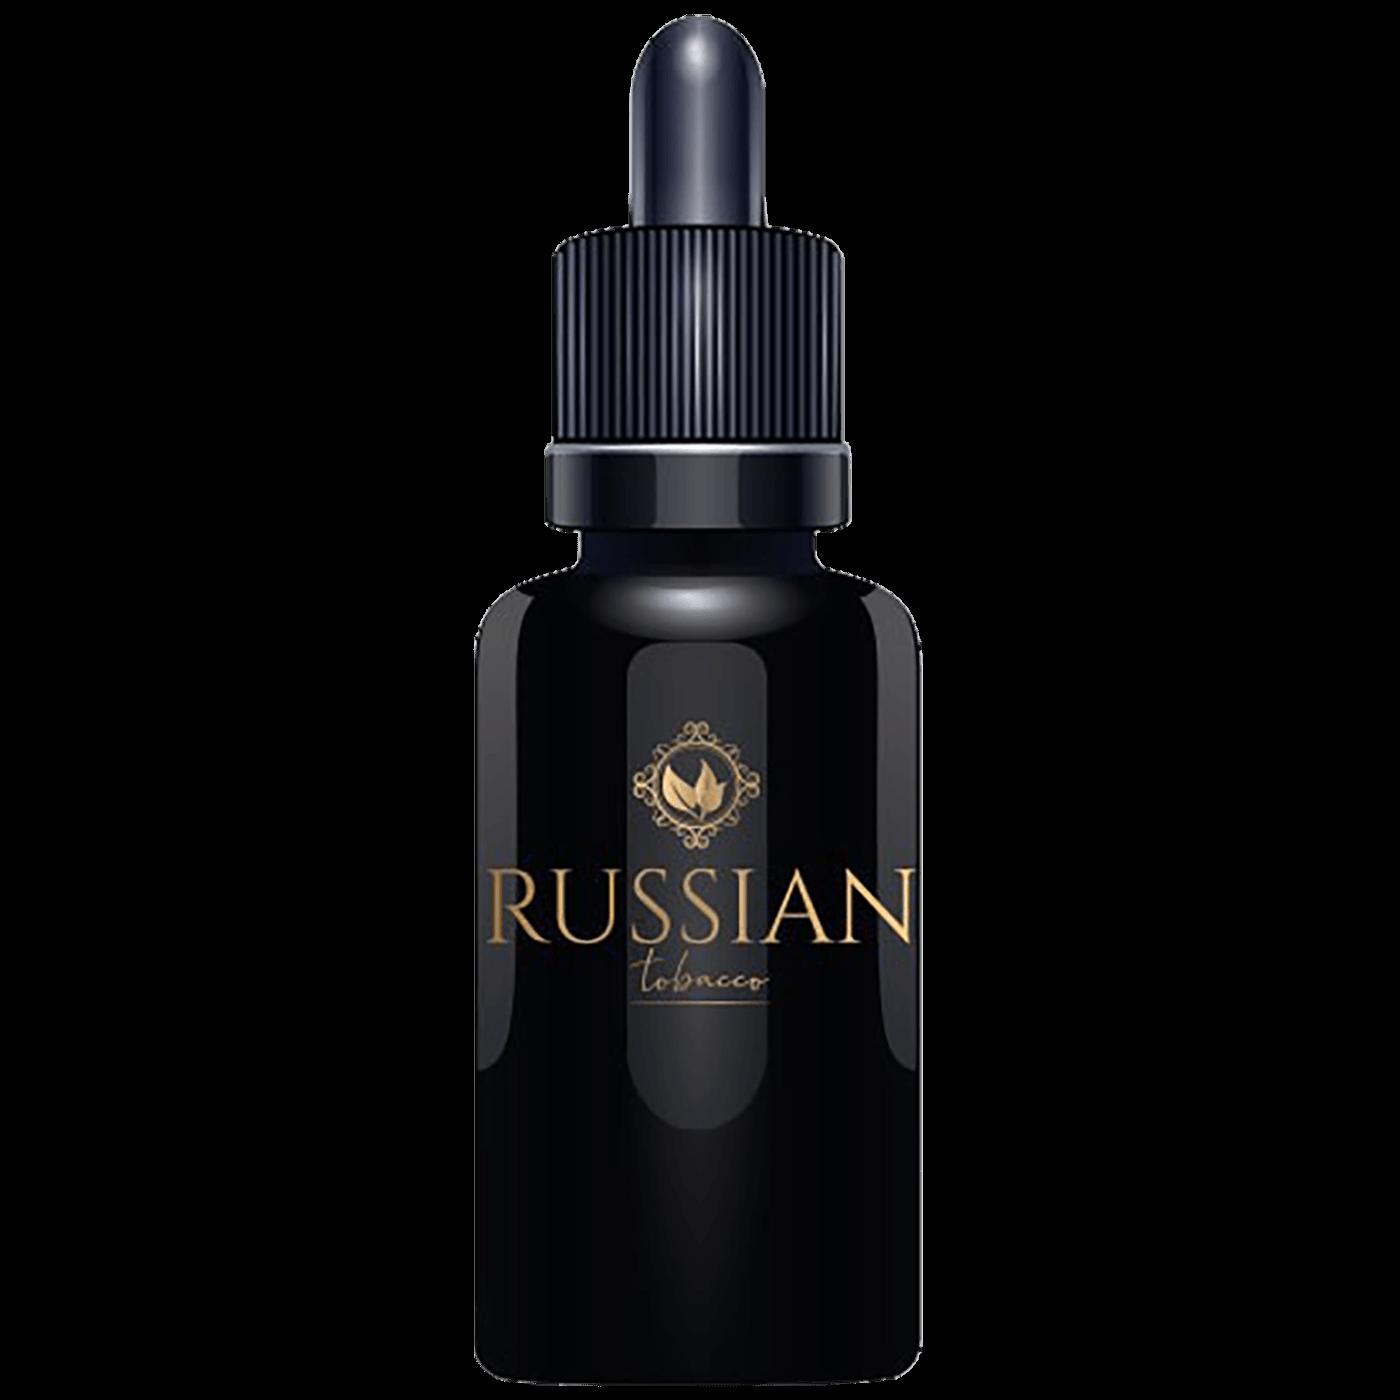 Tekućina za e-cigarete, Russian Tobacco, 30ml,  9mg